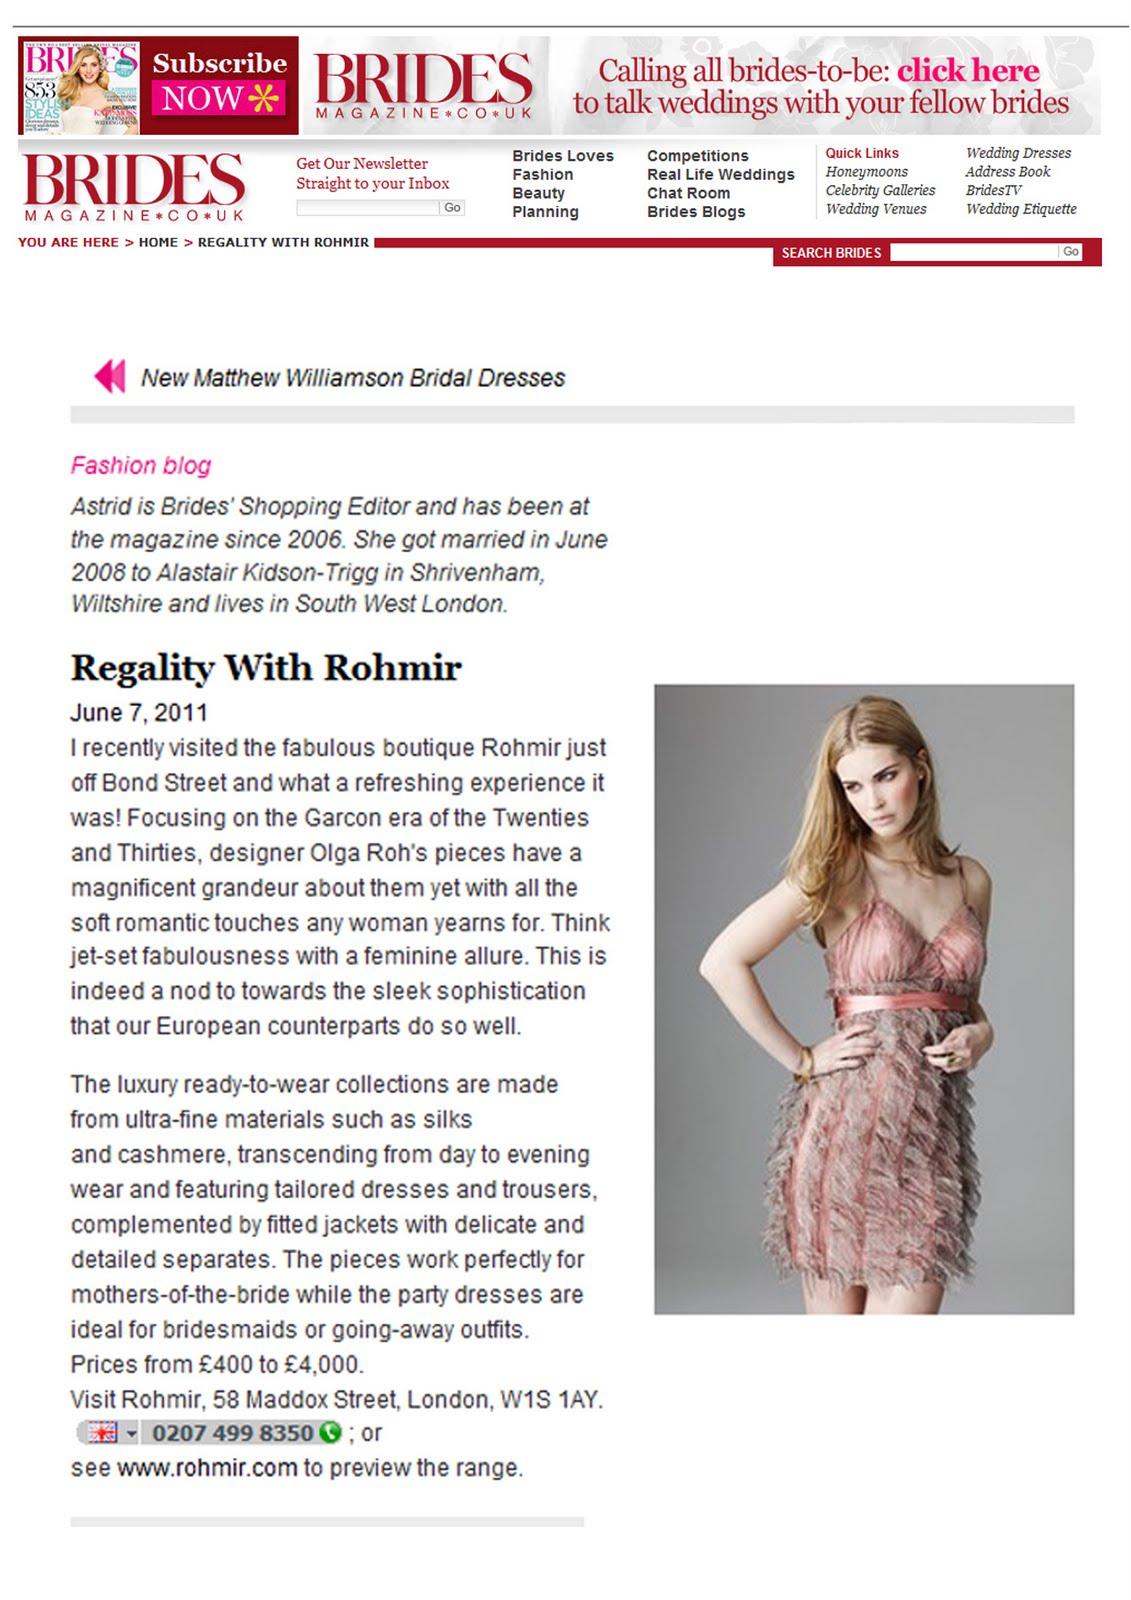 Brides Magazine in FW11 Rohmir dress